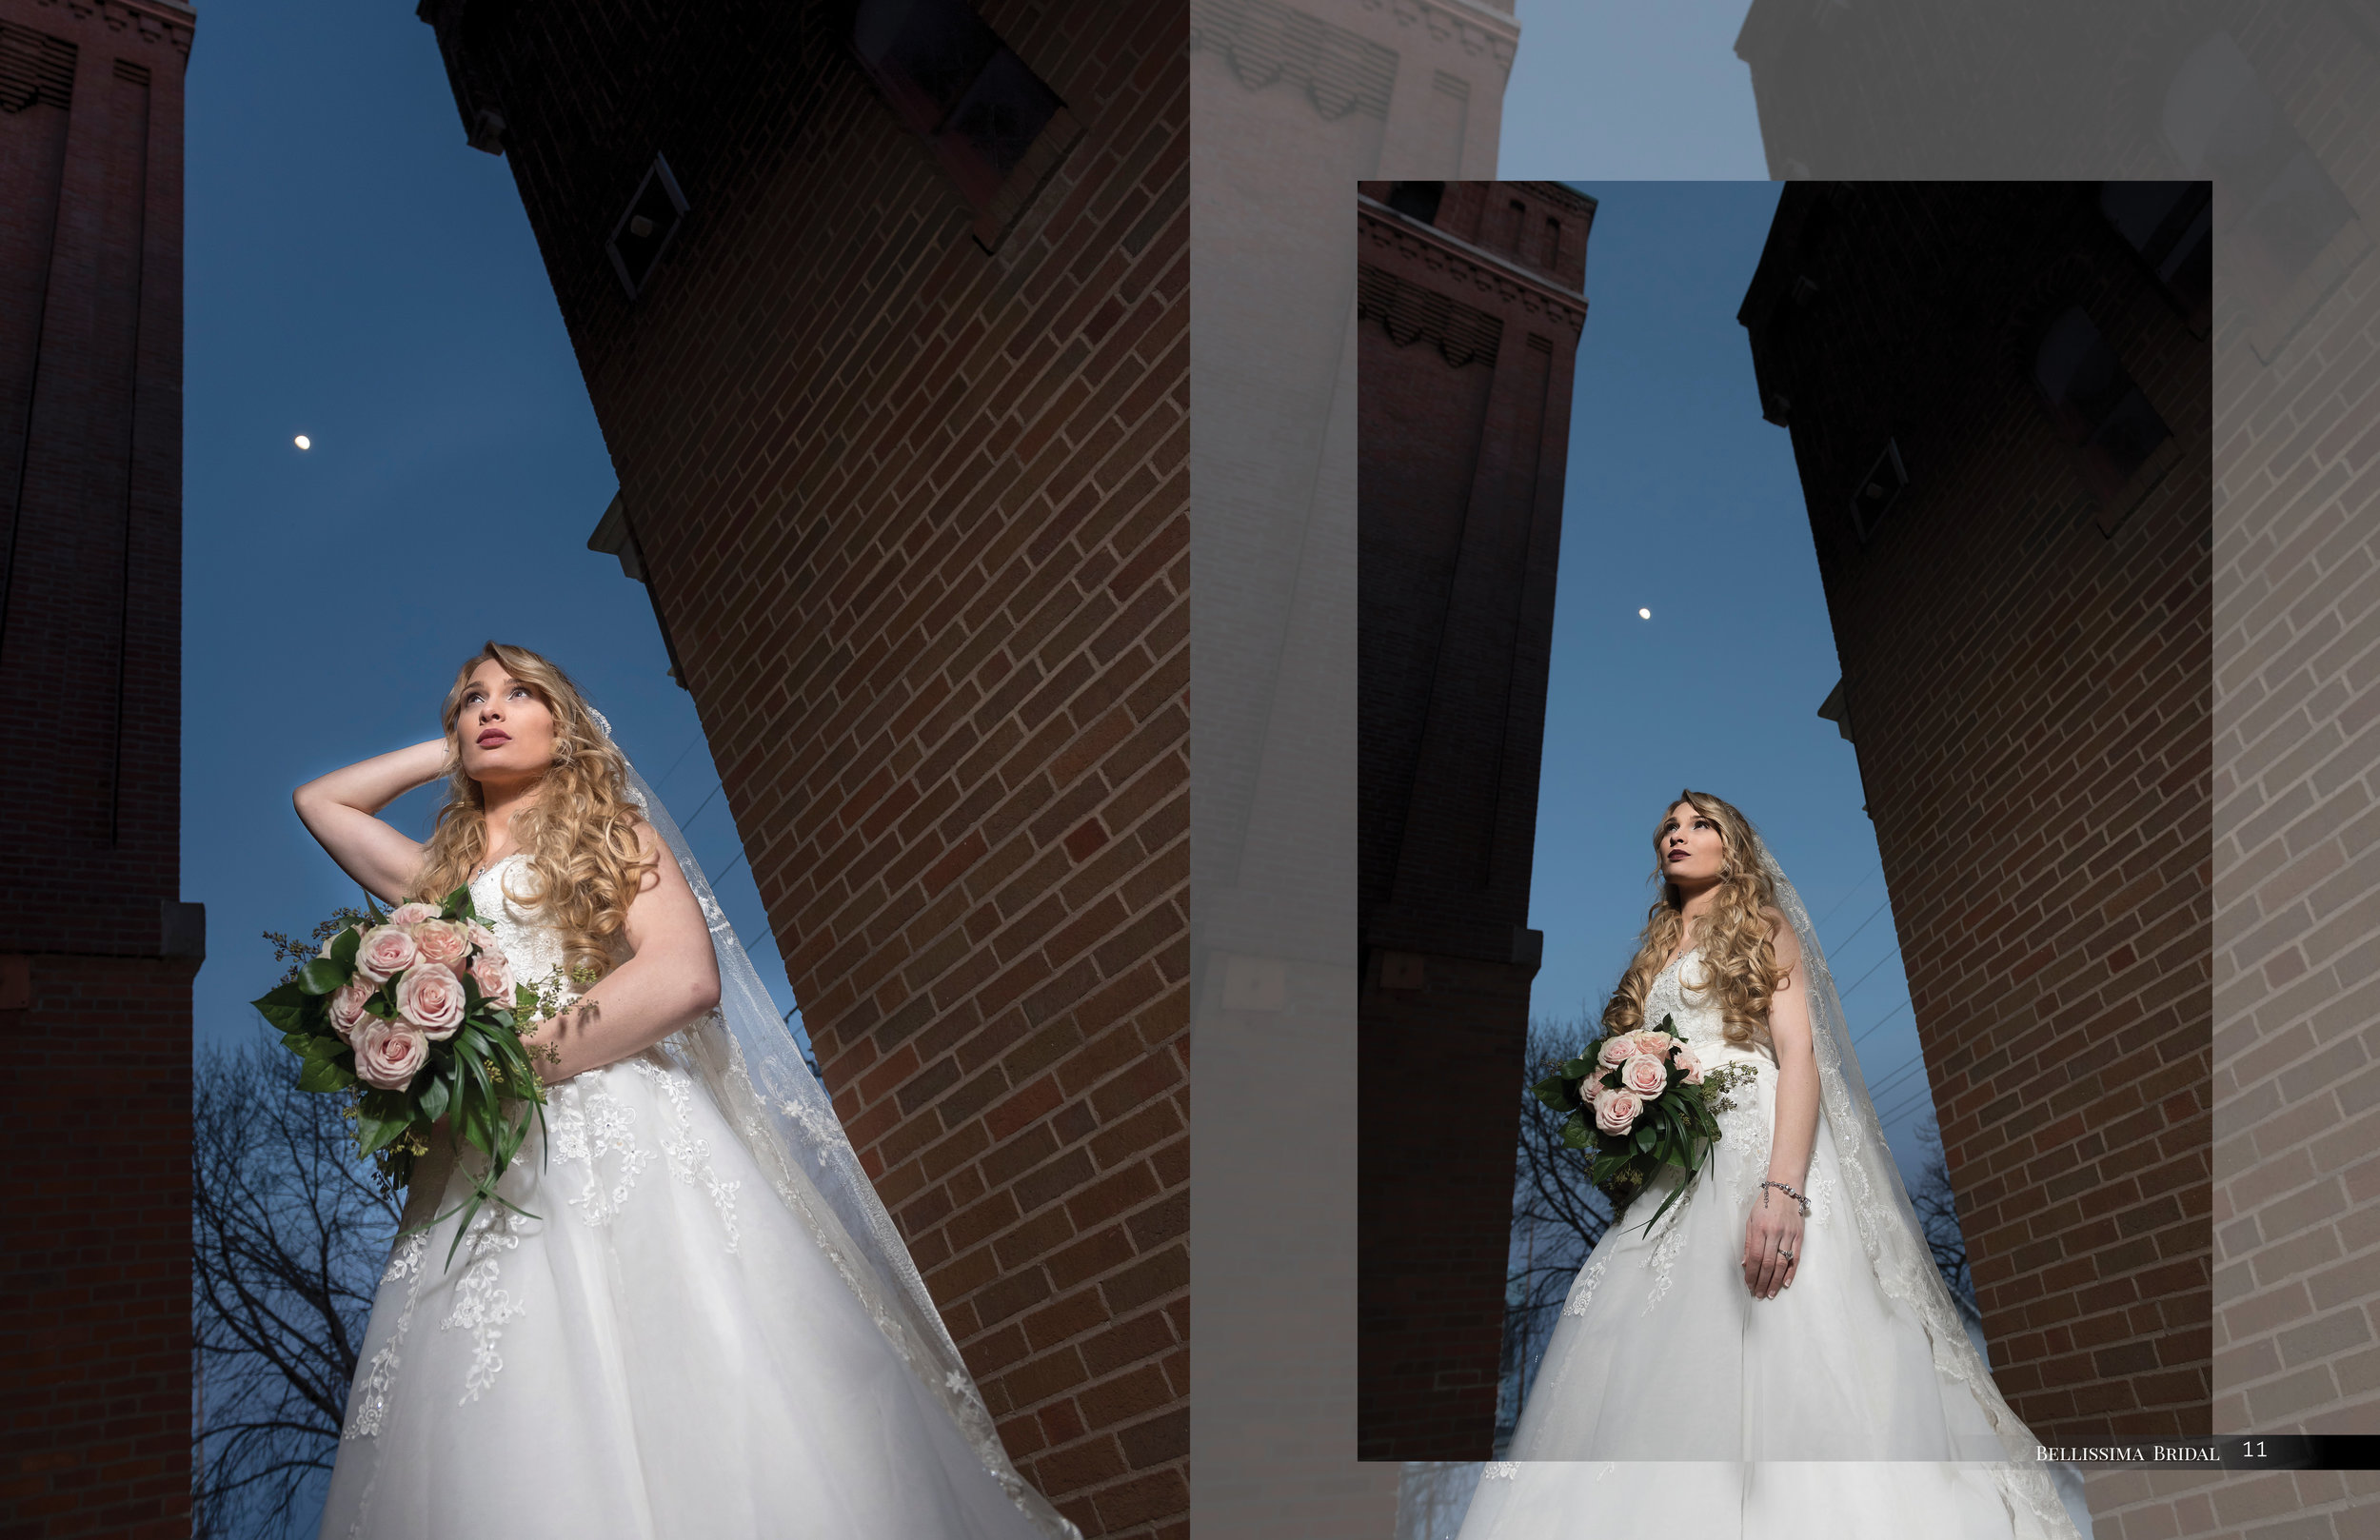 Bellissima Bridal 35_6.jpg